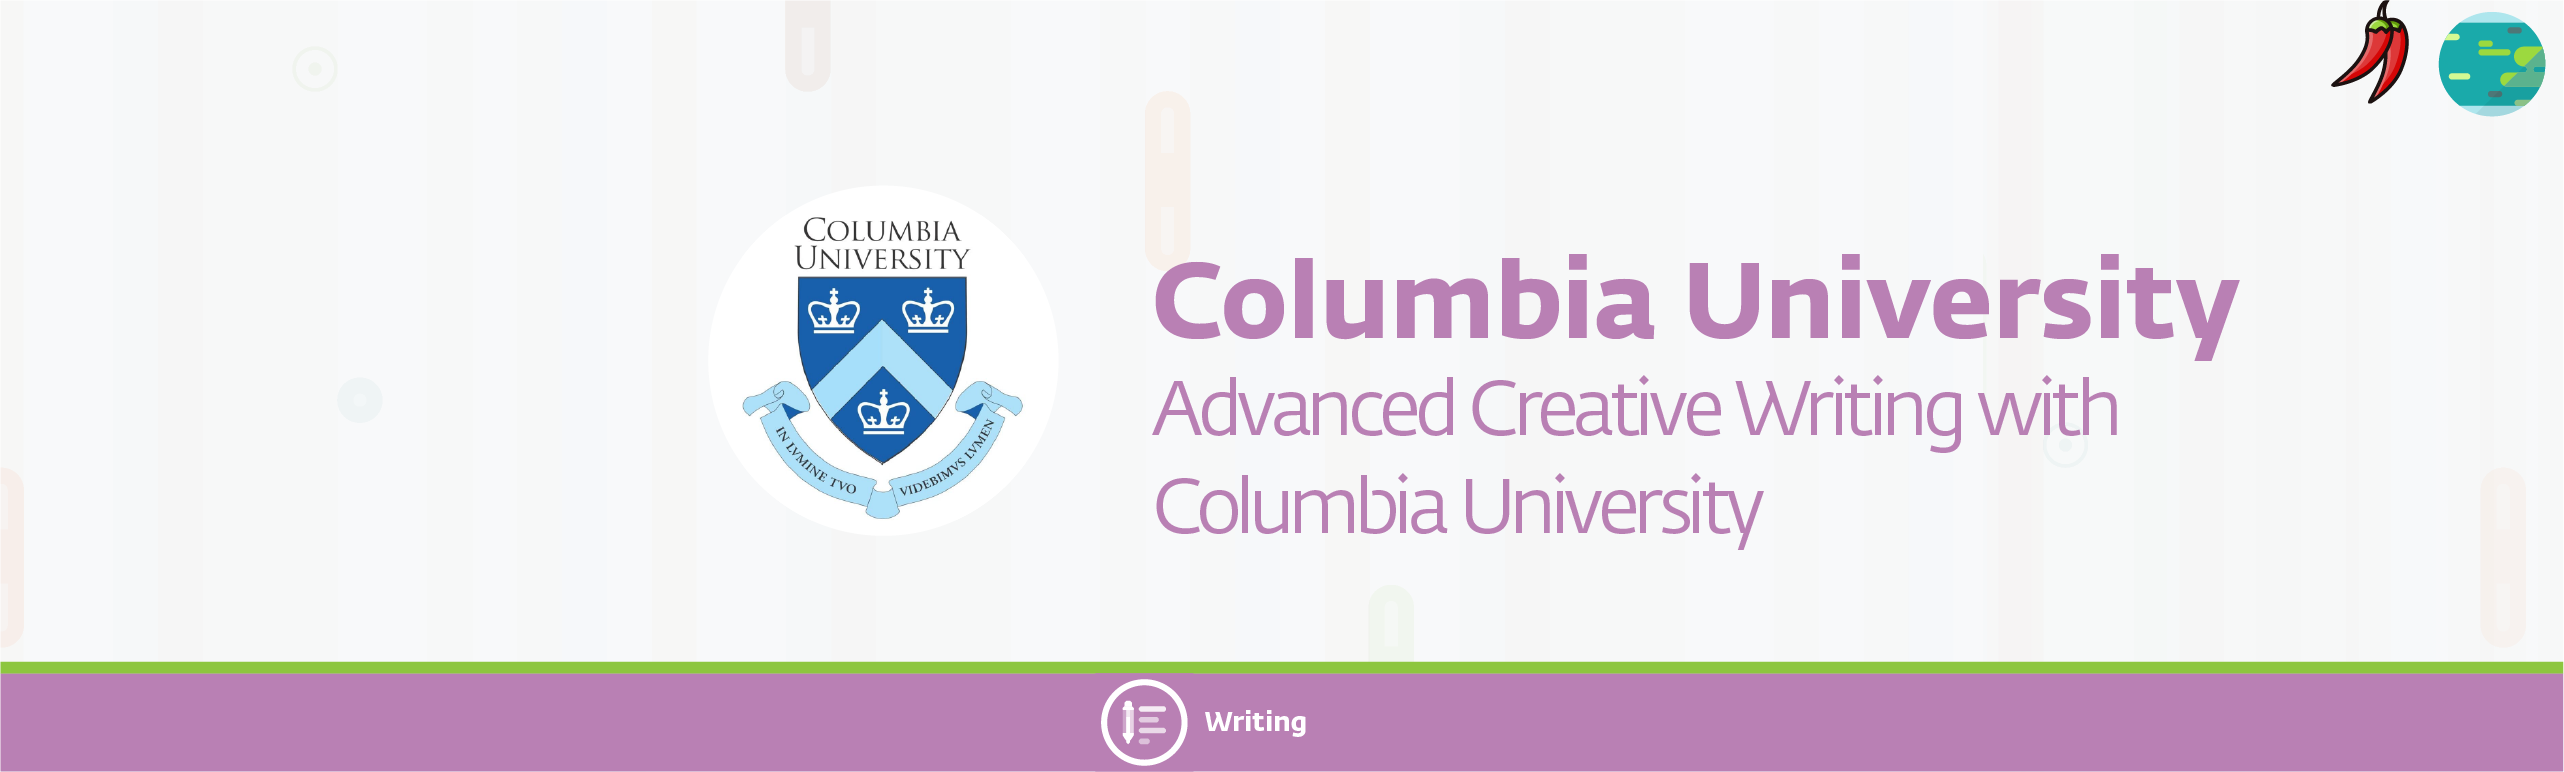 columbia 1 33 - Advanced Creative Writing with Columbia University